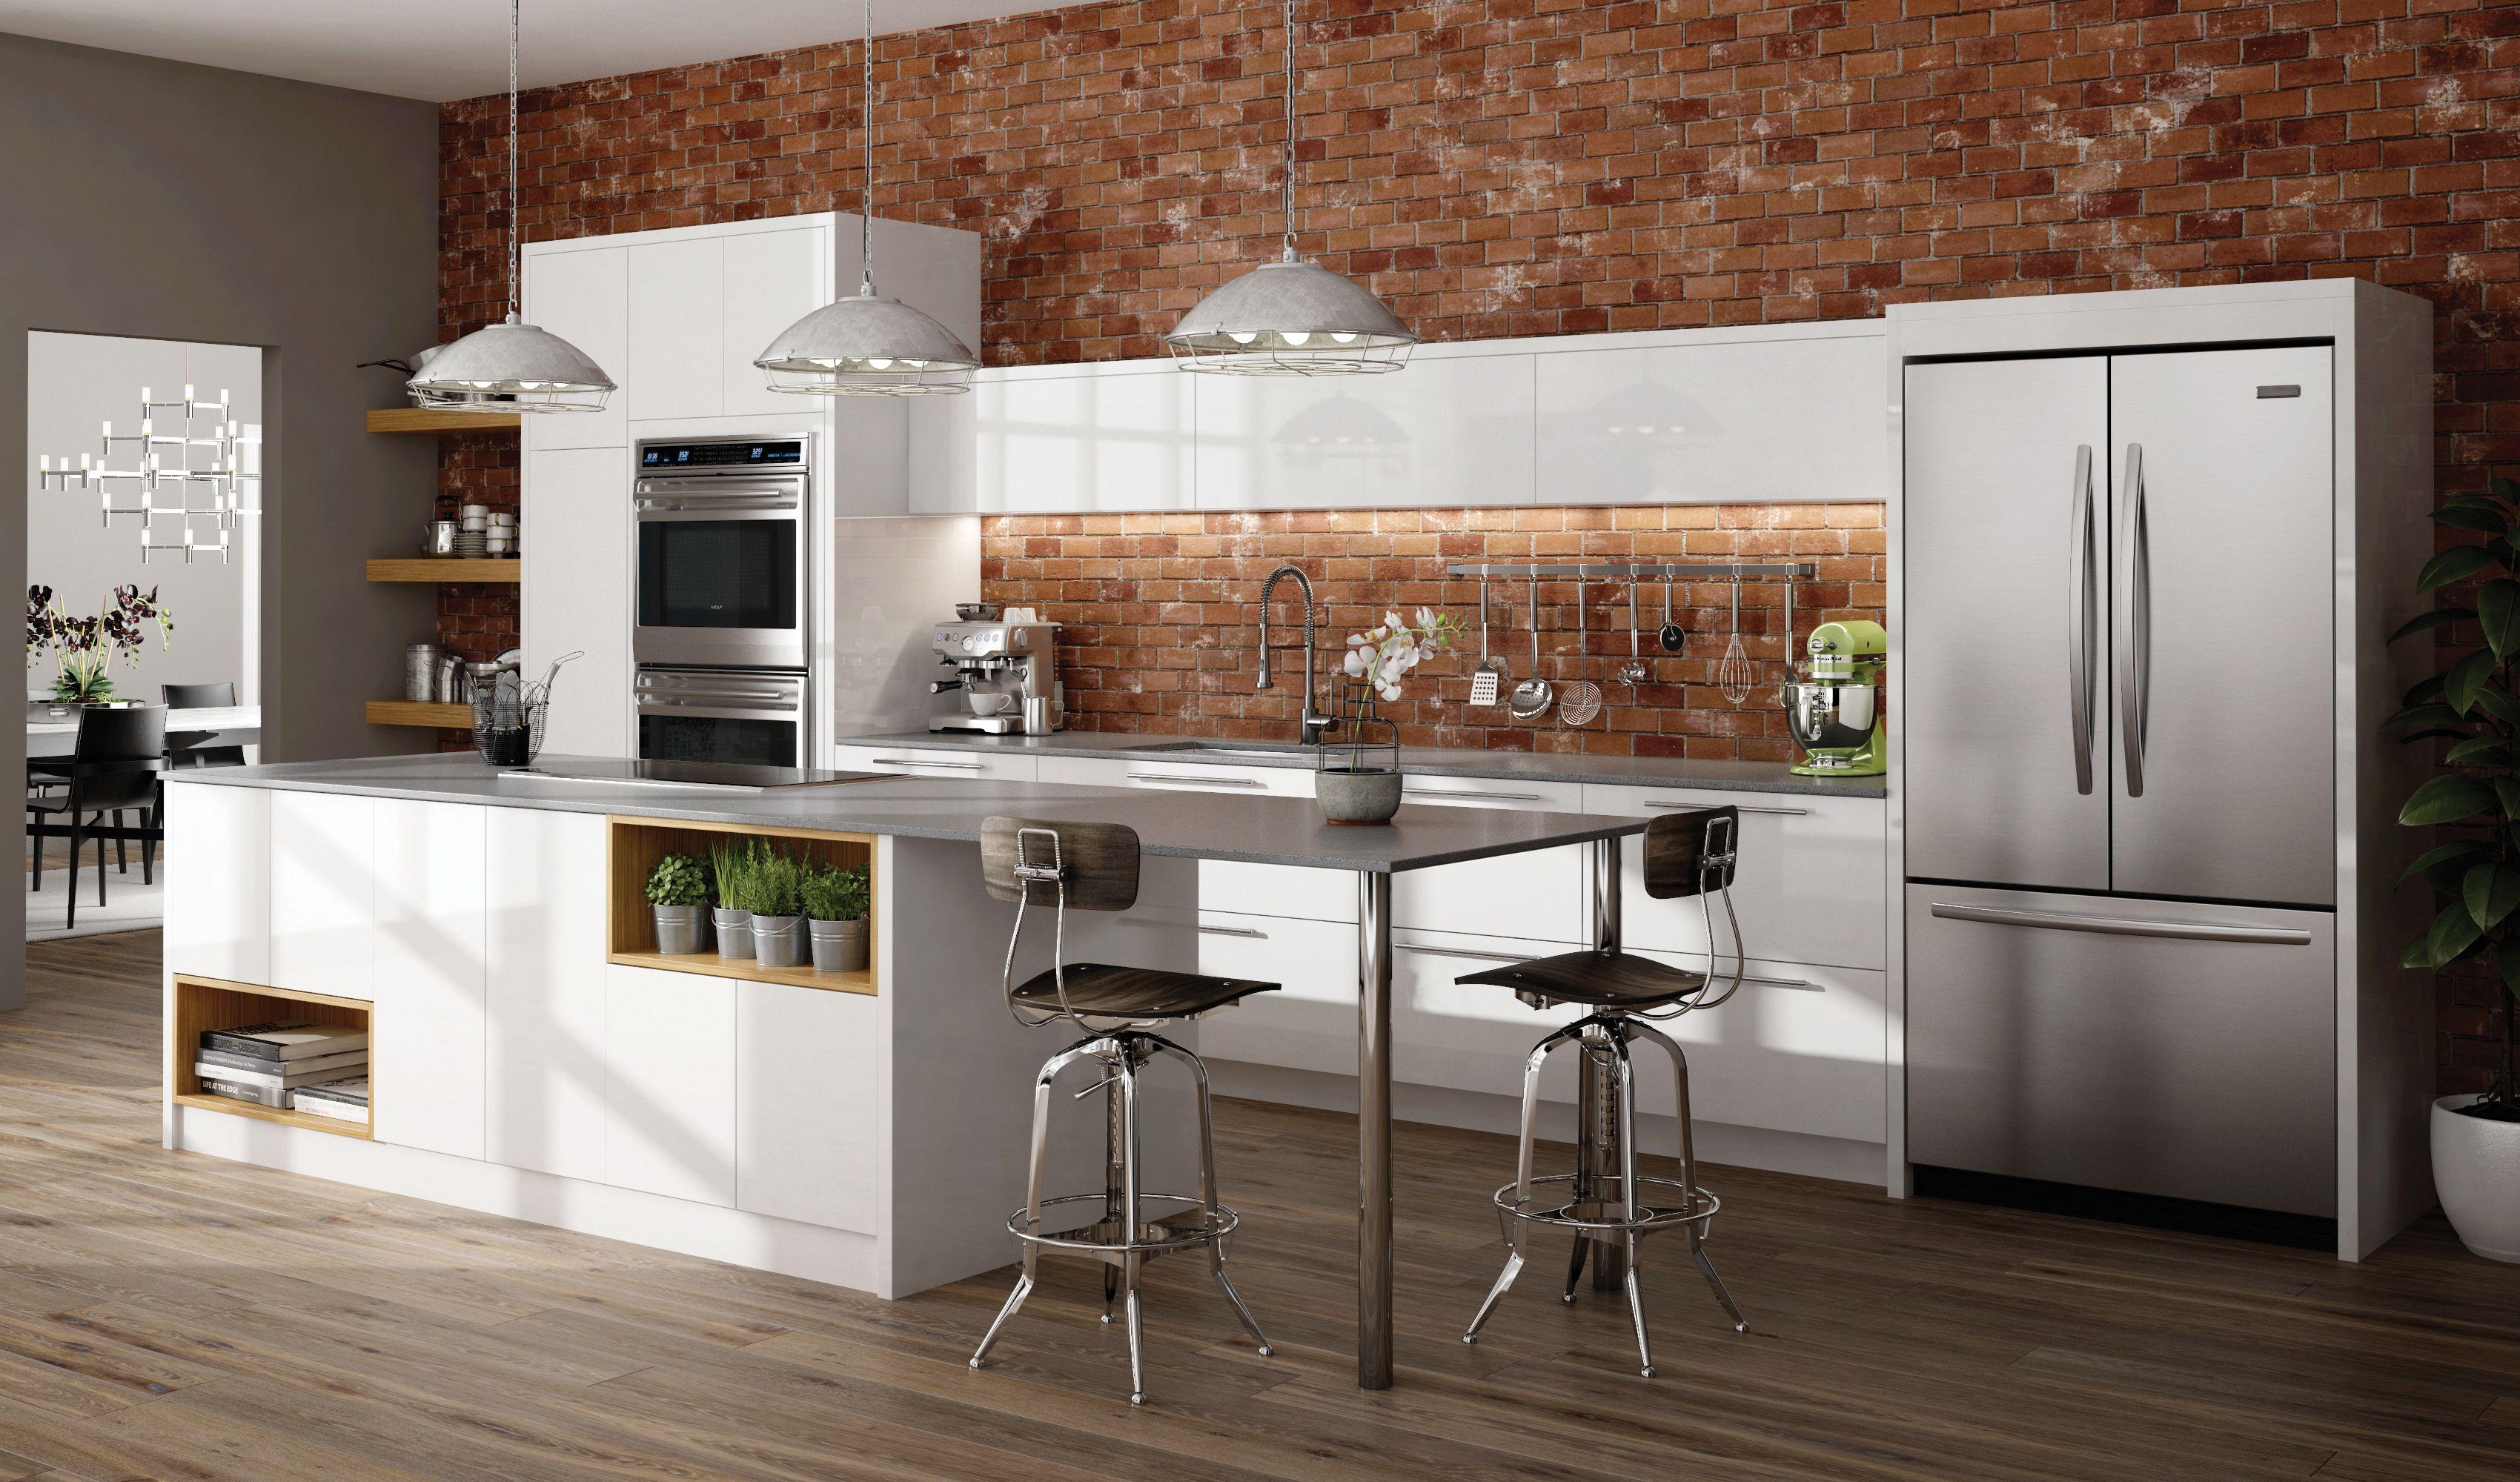 Latitude Cabinets Echo Gloss Laminate Bianco Gloss White Modern Kitchen Order Kitchen Cabinets Pantry Cabinet